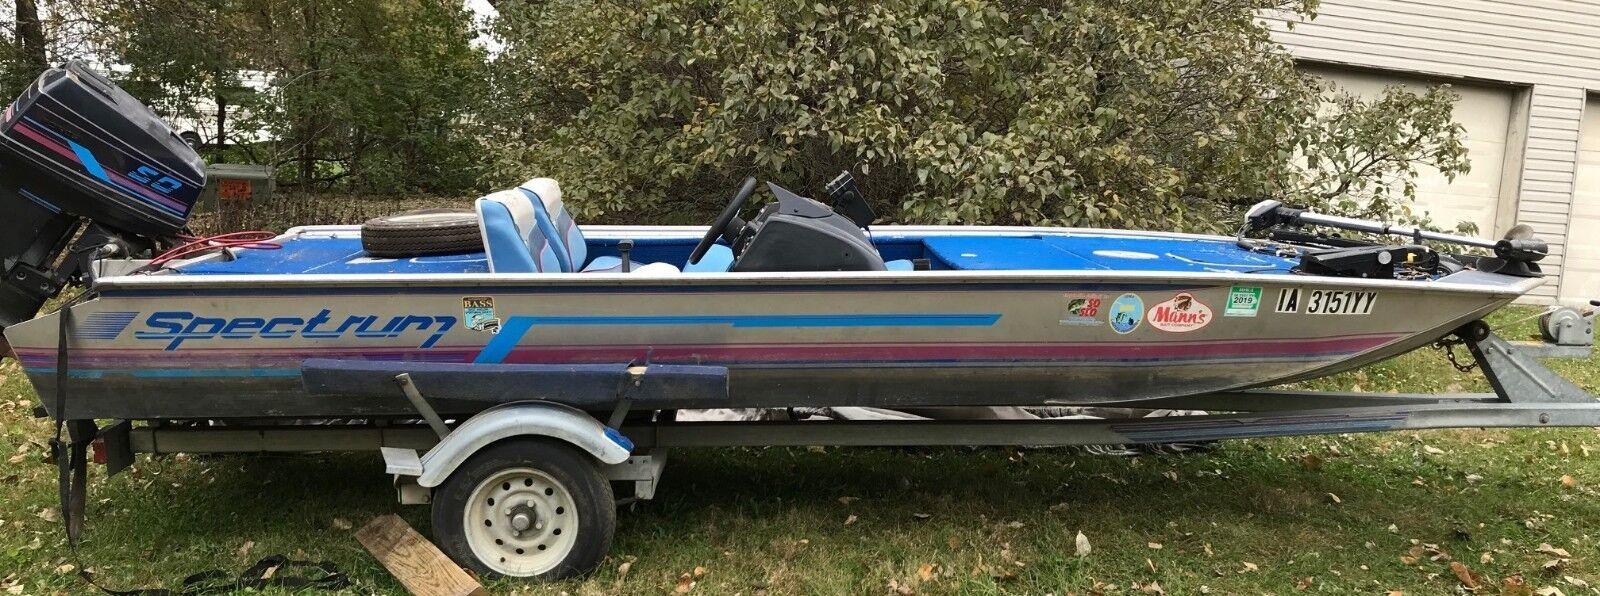 "1989 Spectrum 16'7"" Aluminum Bass Boat & Trailer - Iowa"